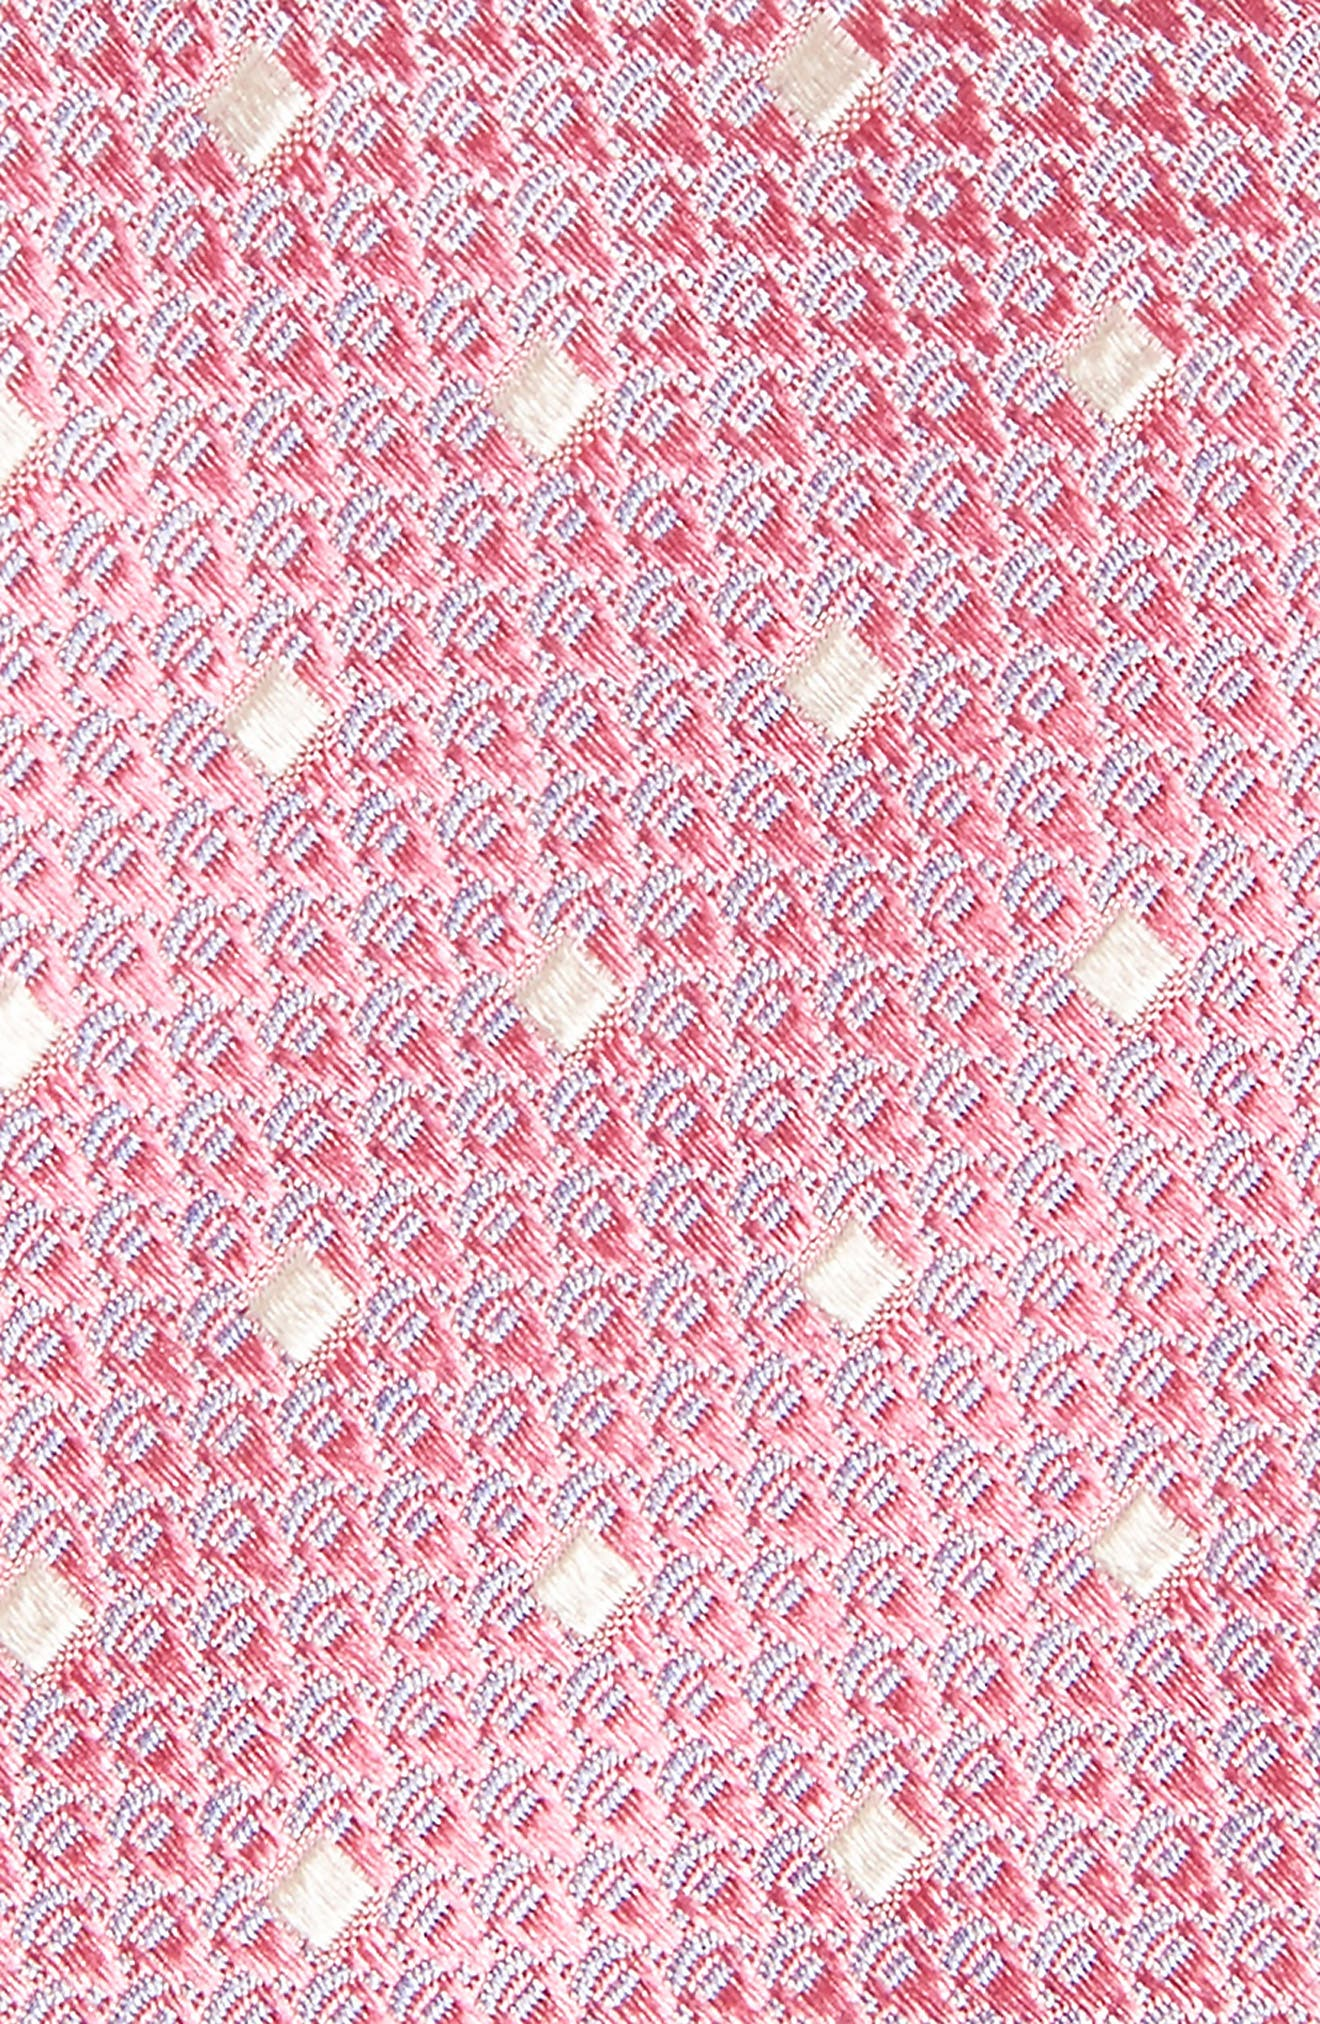 Contrada Dot Silk Tie,                             Alternate thumbnail 2, color,                             Pink